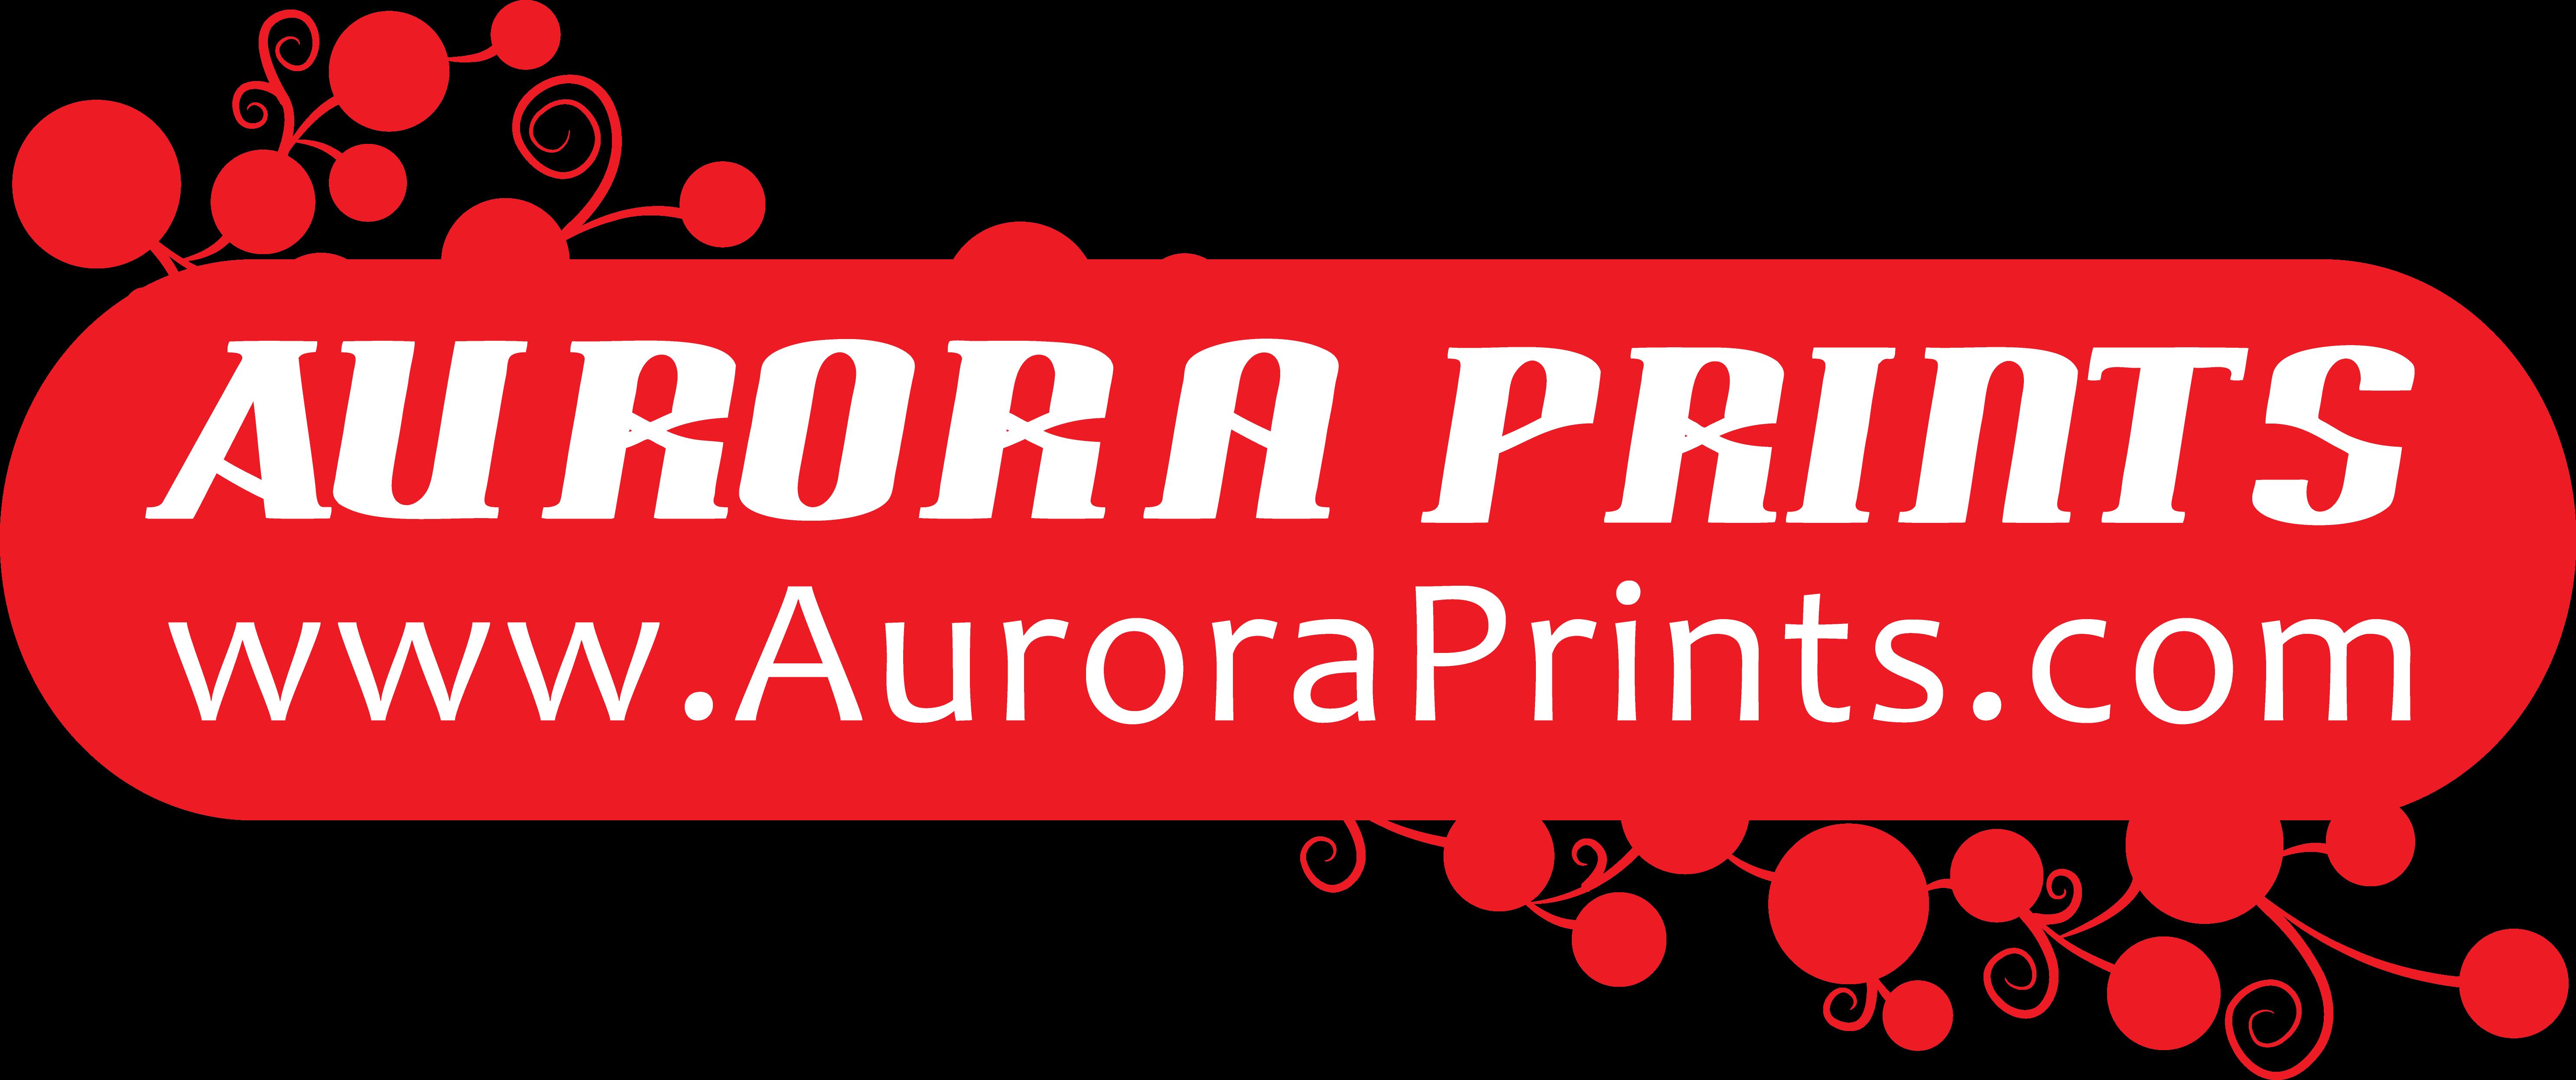 Aurora Prints Logo